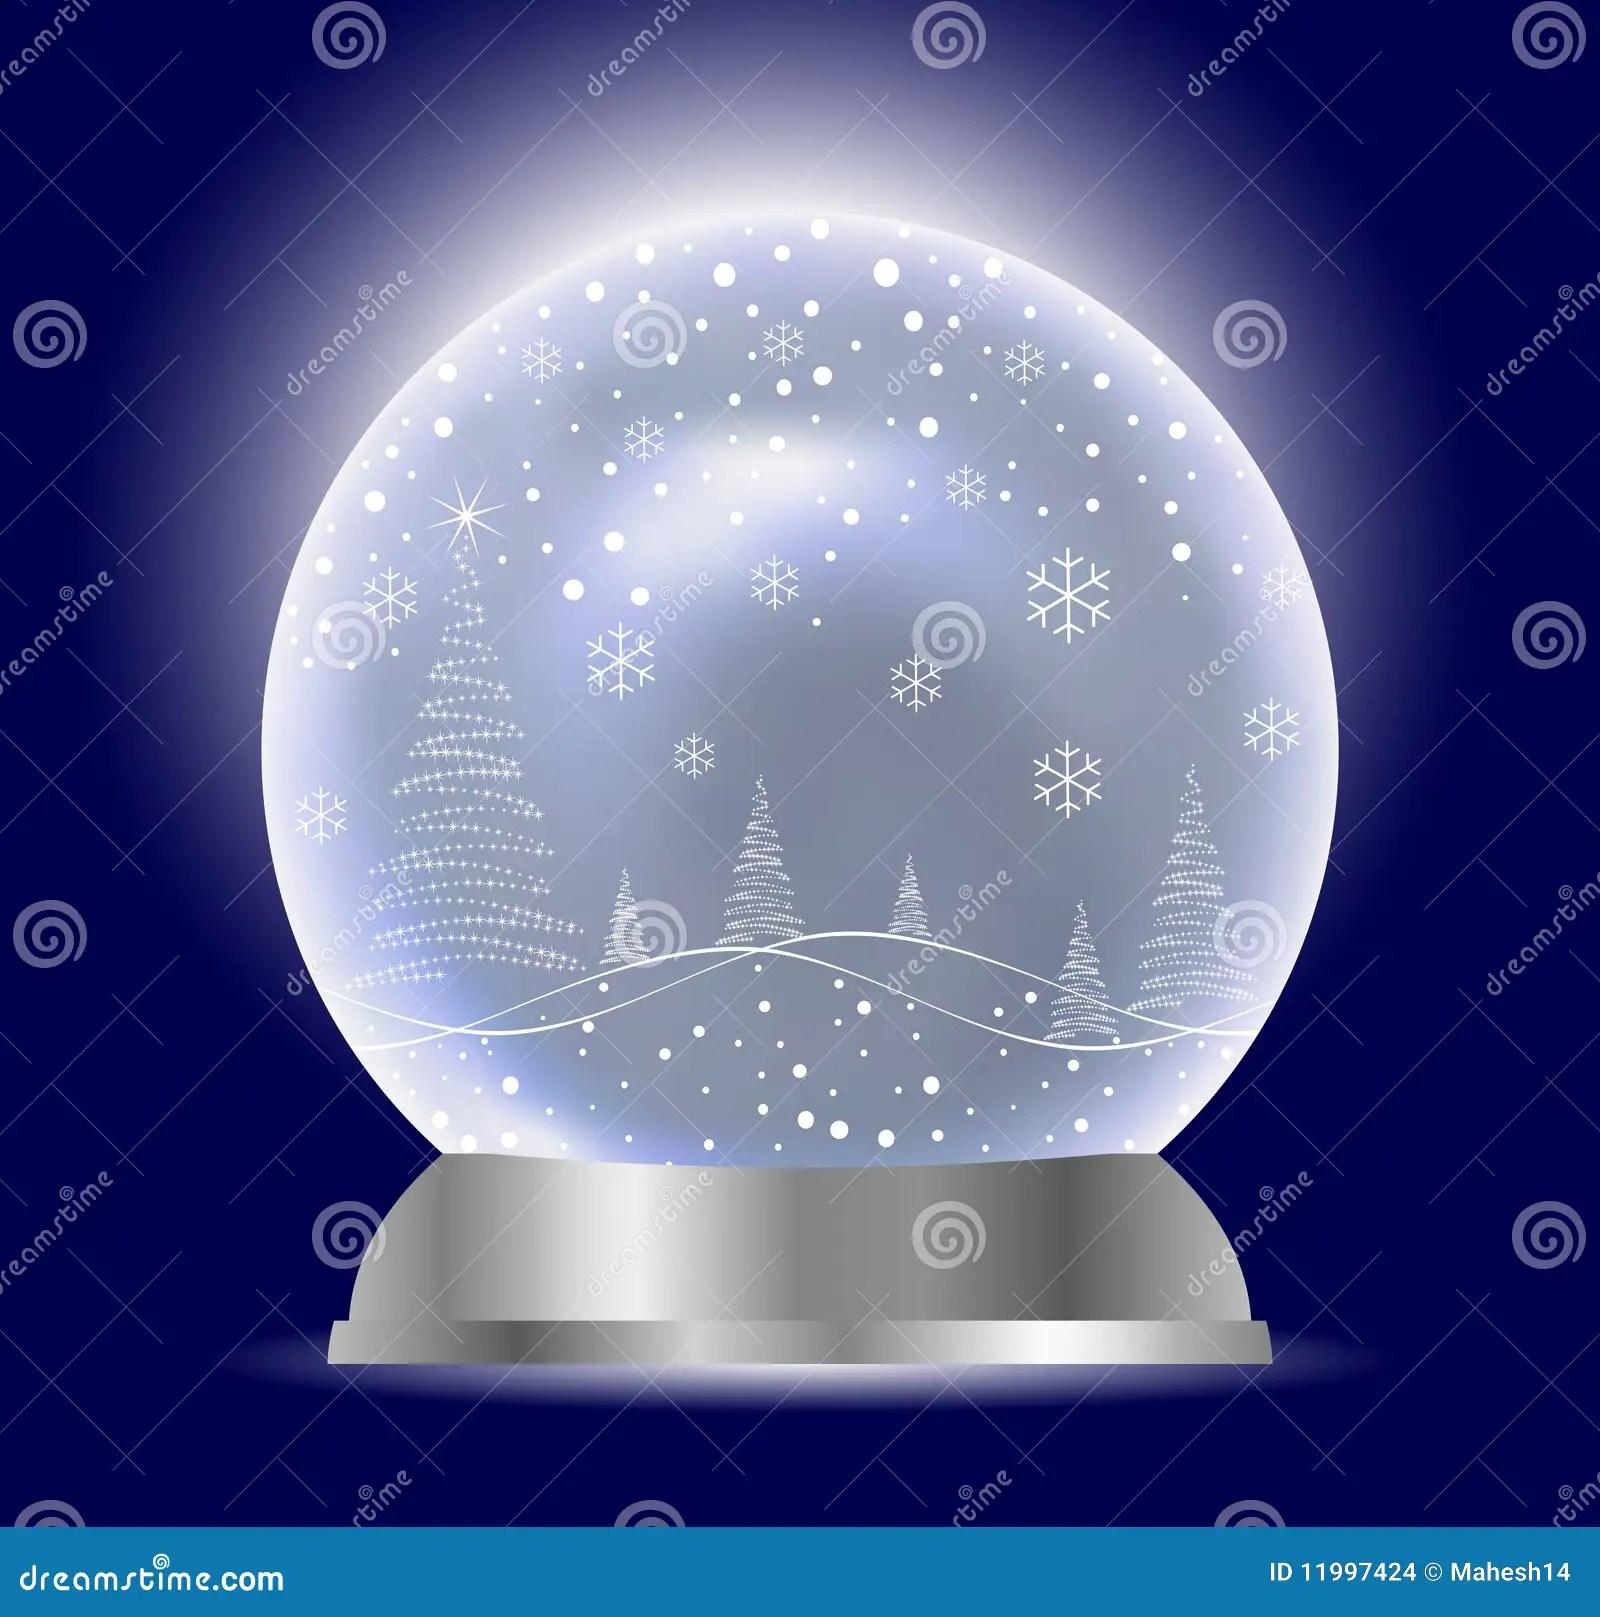 Christmas Vector Snow Globe Stock Vector Illustration Of